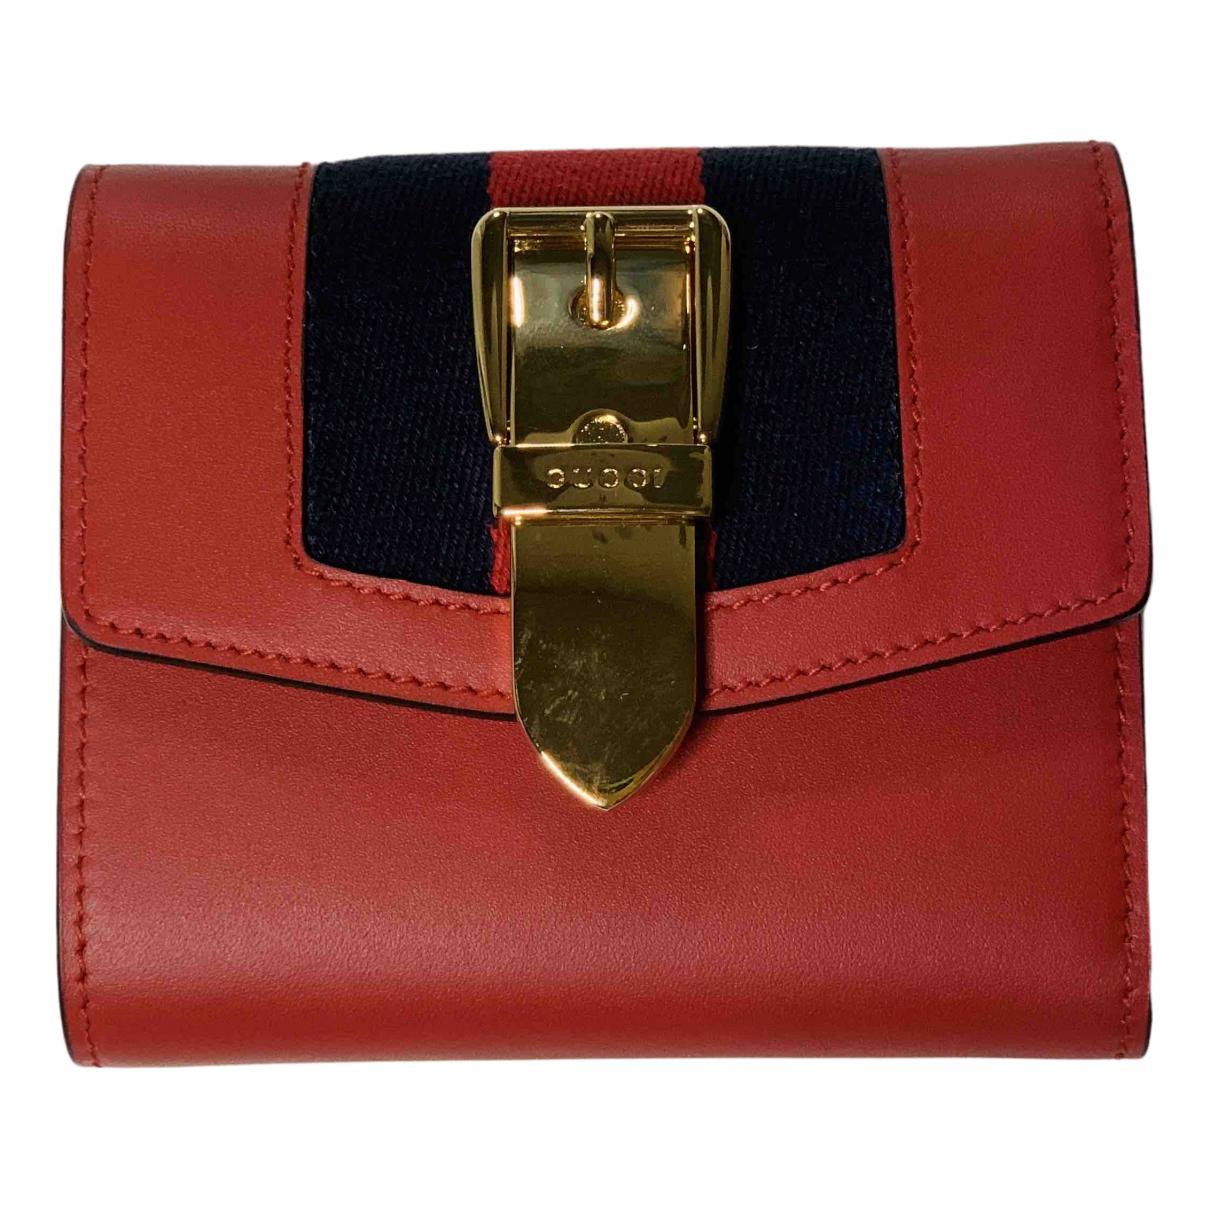 Gucci Sylvie Kleinlederwaren in  Rot Leder